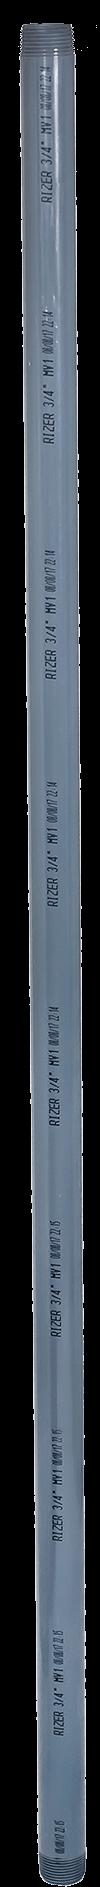 Нипел за разпръсквач PVC